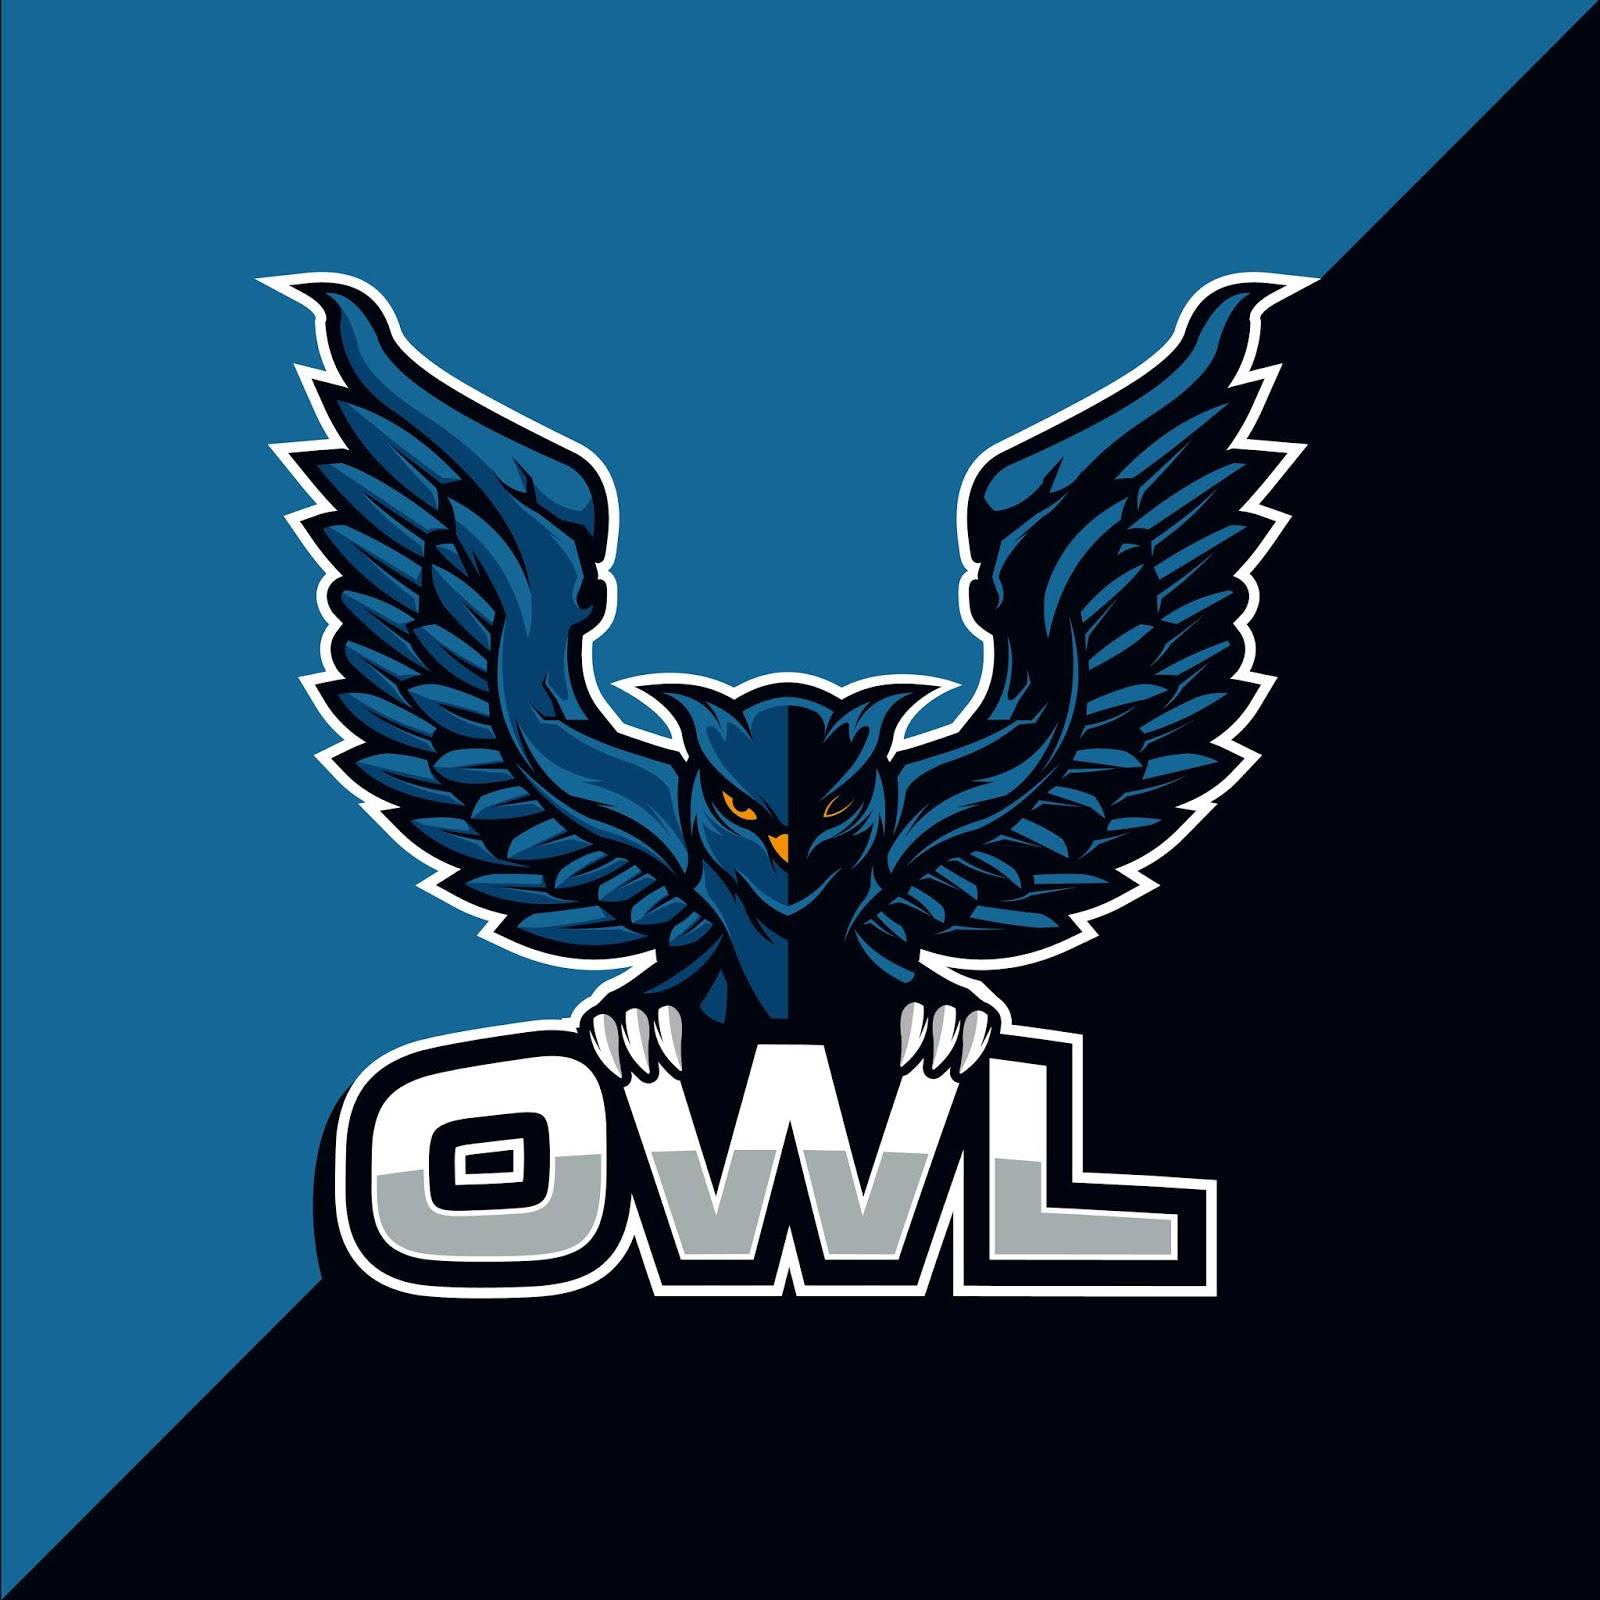 Owl Bird Mascot Esport Logo Design Free Download Vector CDR, AI, EPS and PNG Formats